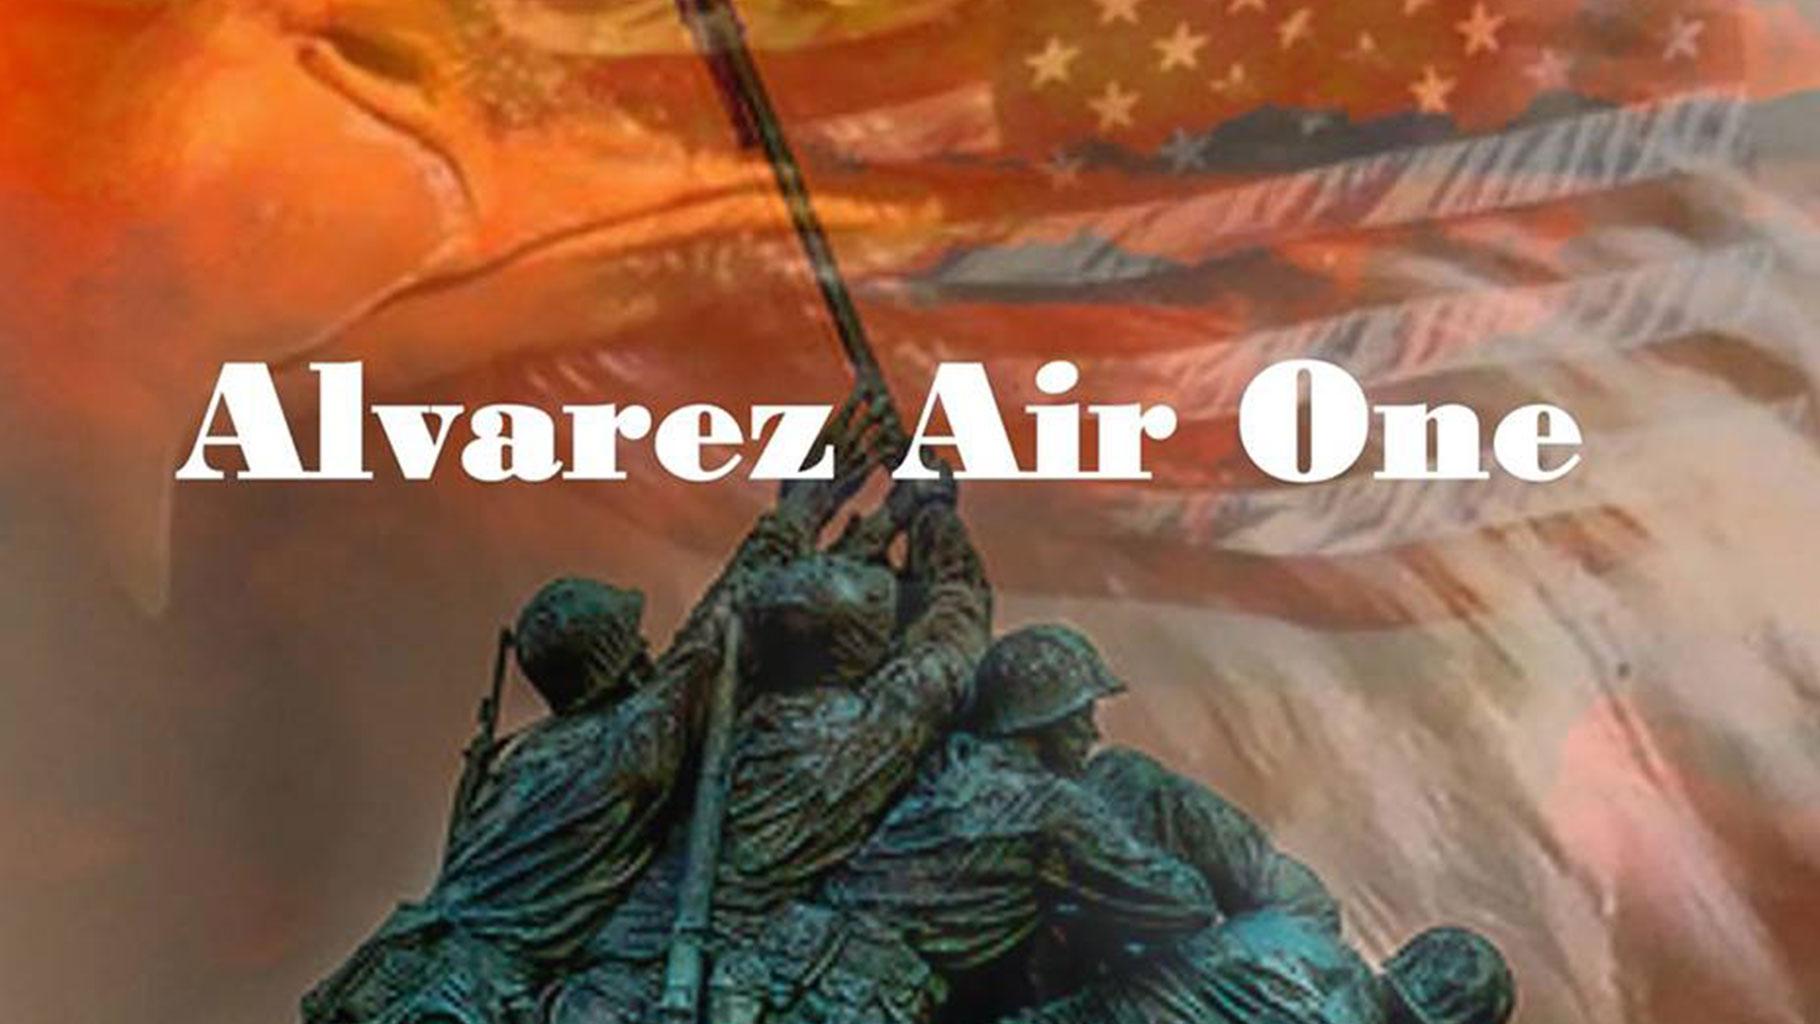 Alvarez Air One LLC HVAC Services